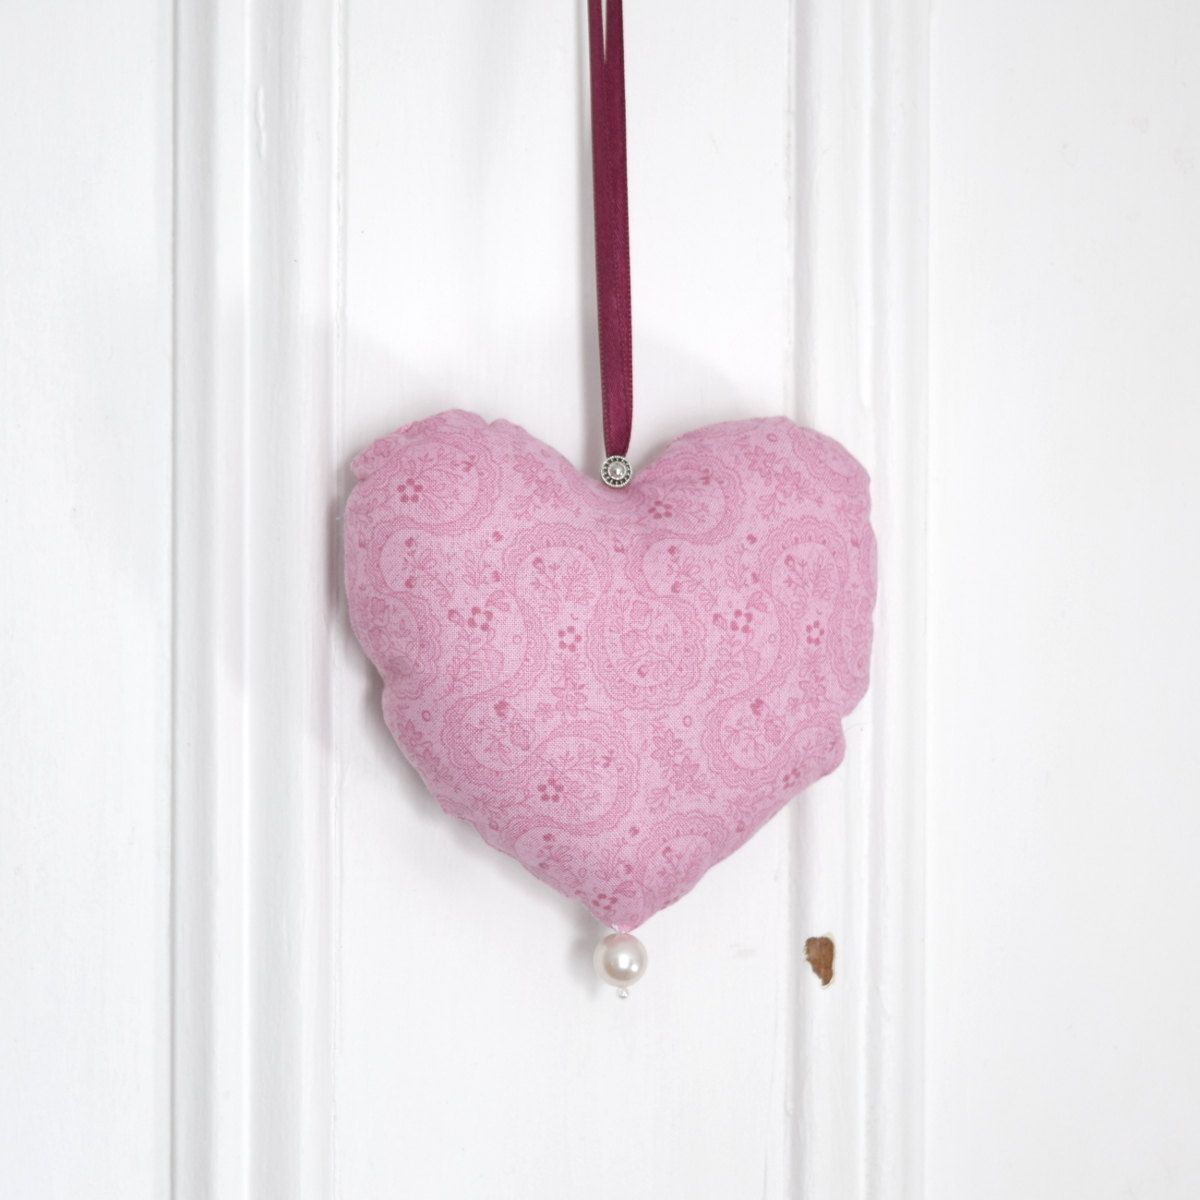 Fabric heart to hang Pink Ribbon Ornament Door hanger Victorian Decoration Valentine Day Gift for women Birthday Shower Girl de la boutique ChristineGrenier sur Etsy